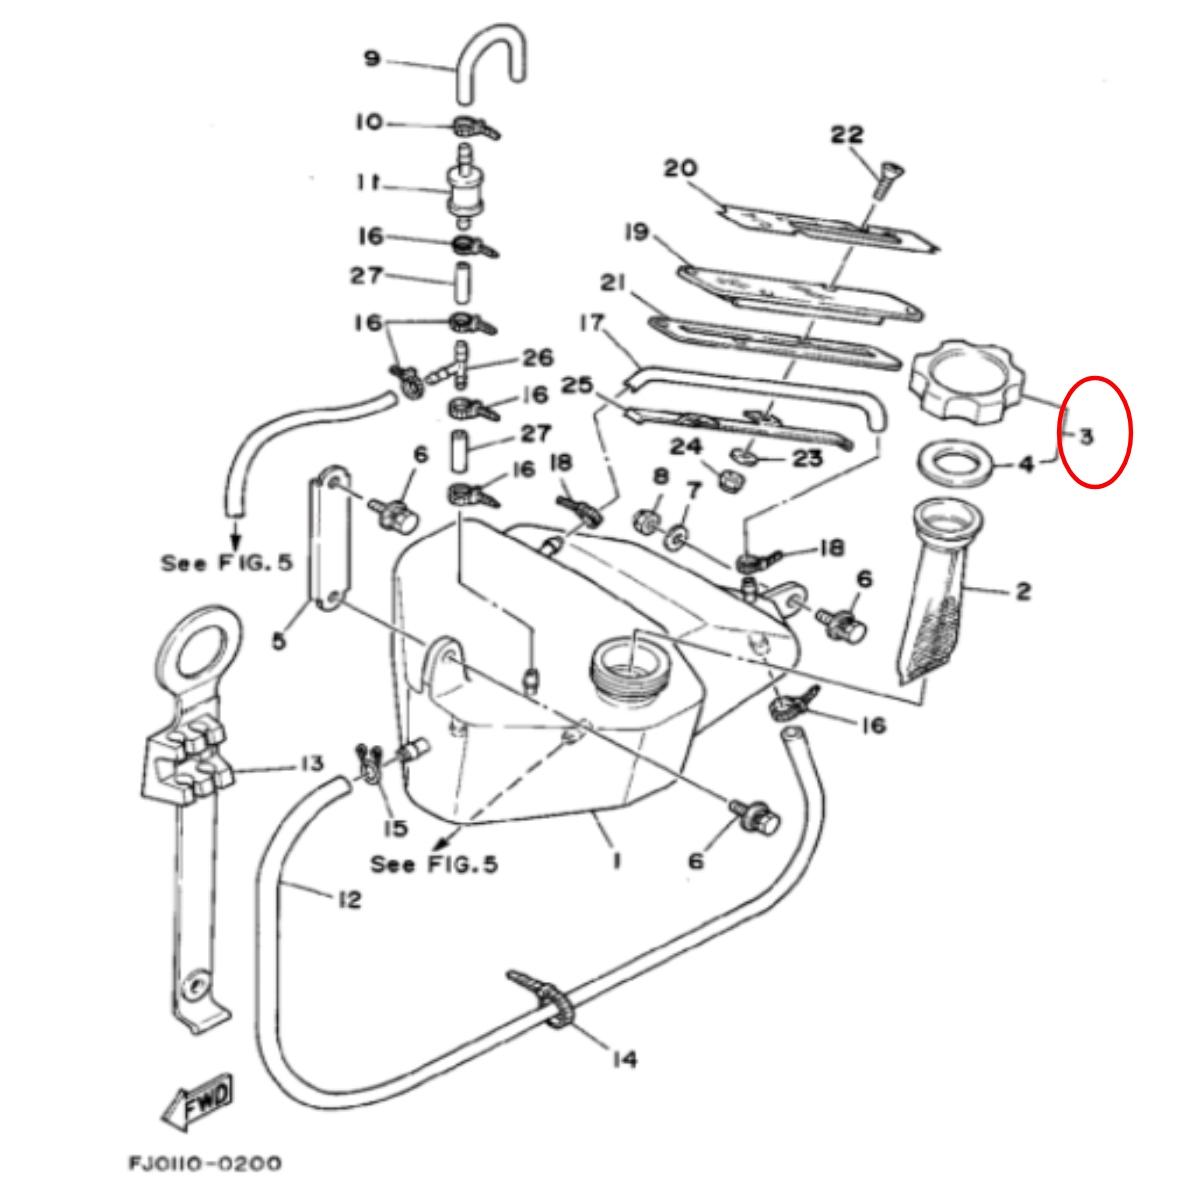 Tampa Tanque de Óleo para Jet Ski Yamaha 2 TEC  - Radical Peças - Peças para Jet Ski